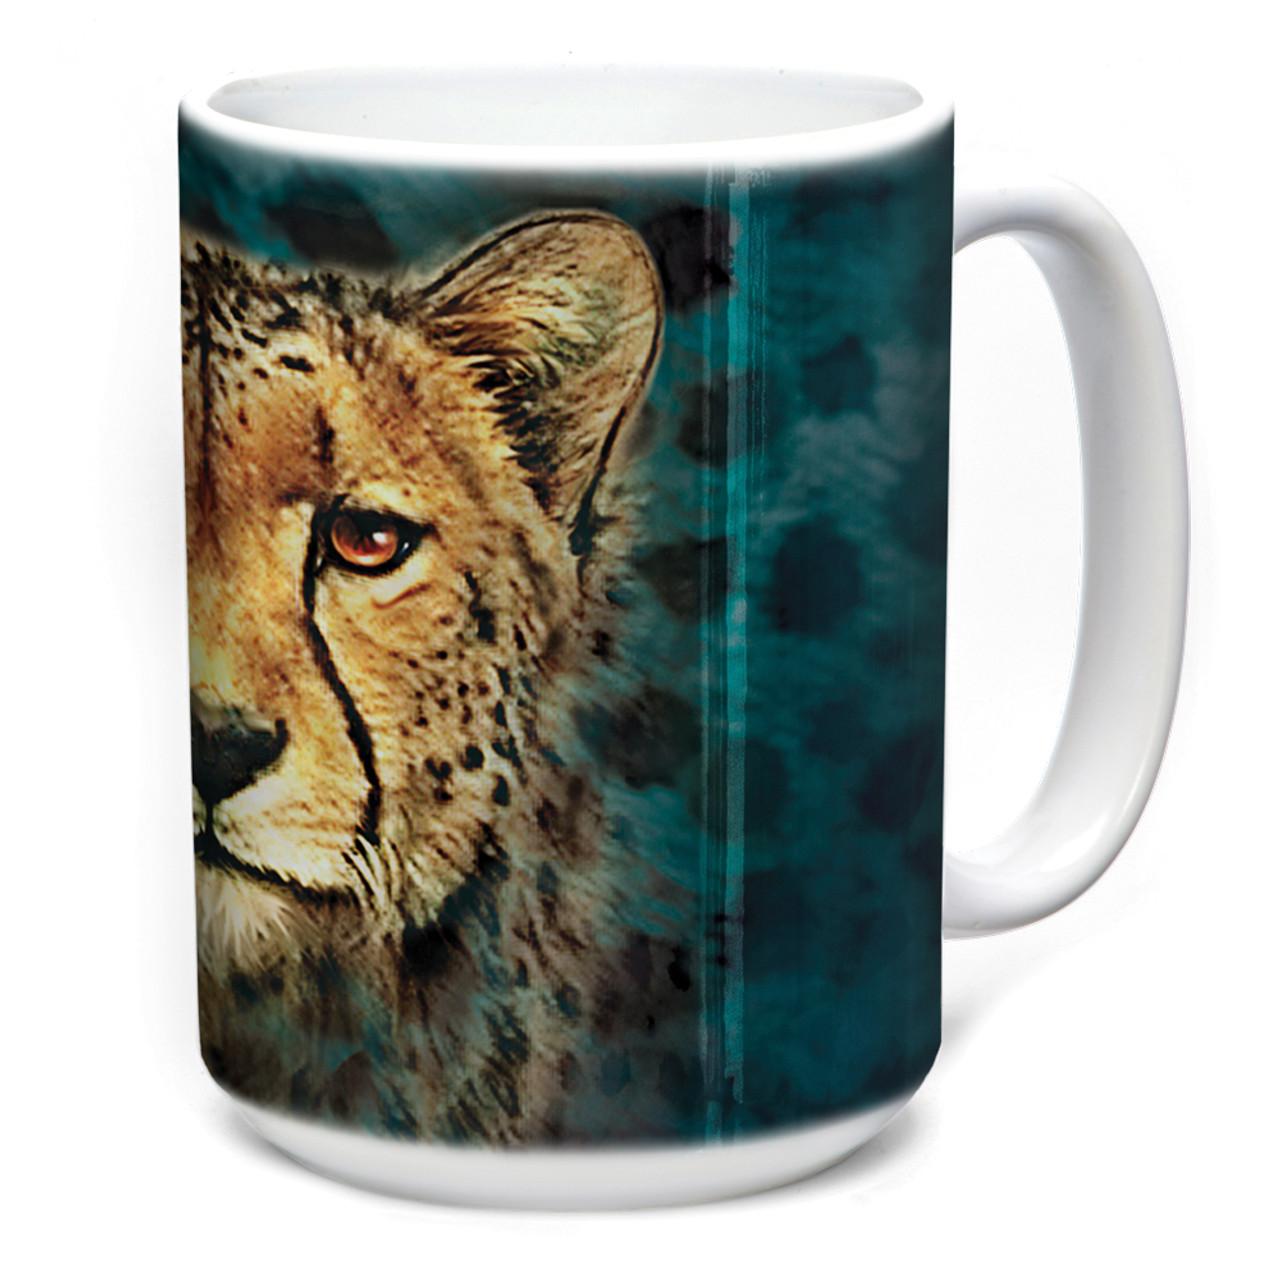 Tami Alba Cheetah Portrait 15 Oz Ceramic Mug The Mountain